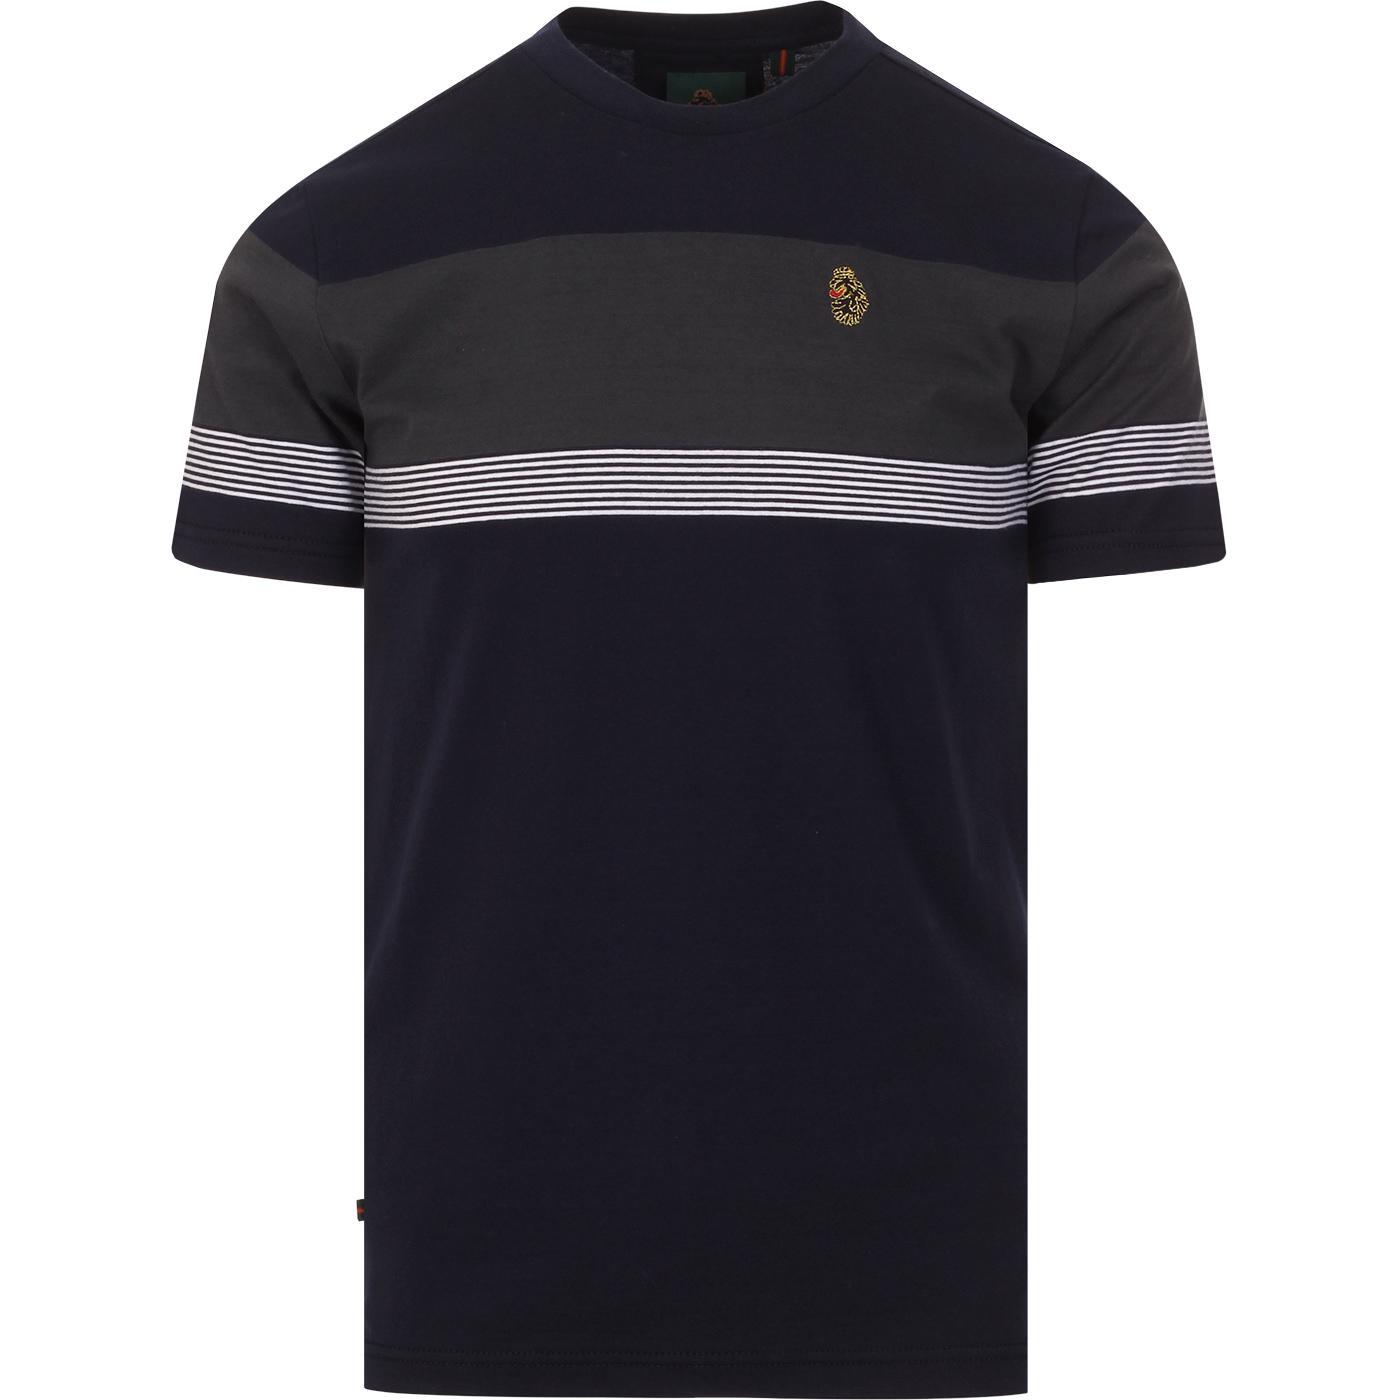 Dublin LUKE Retro Mod Chest Stripe T-shirt (DN)